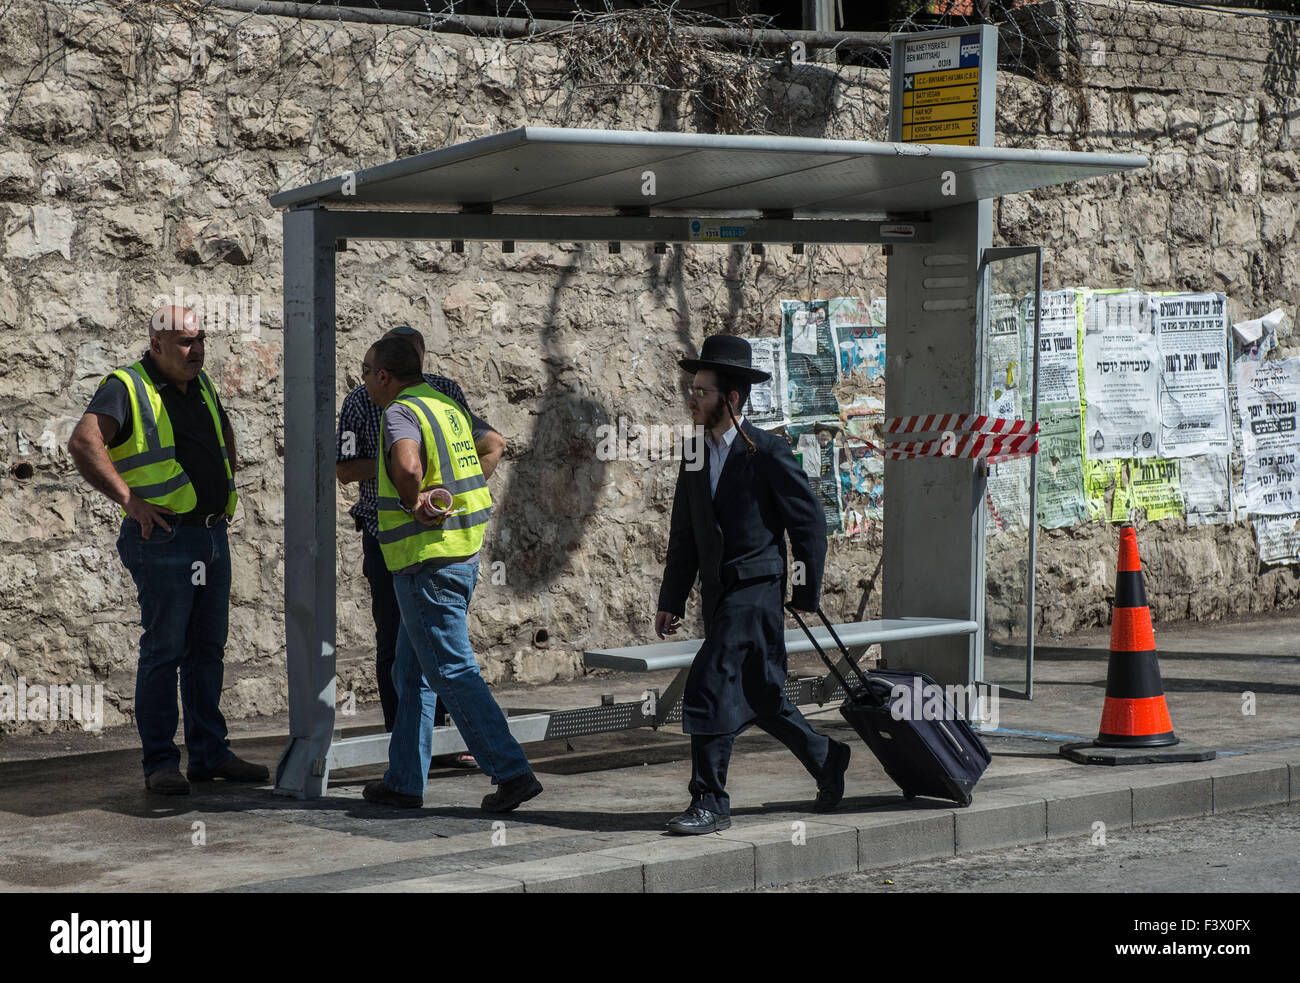 (151013) -- JERUSALEM, Oct. 13, 2015 (Xinhua) -- An ultra-Orthodox Jewish man walks past the site of a bus station - Stock Image